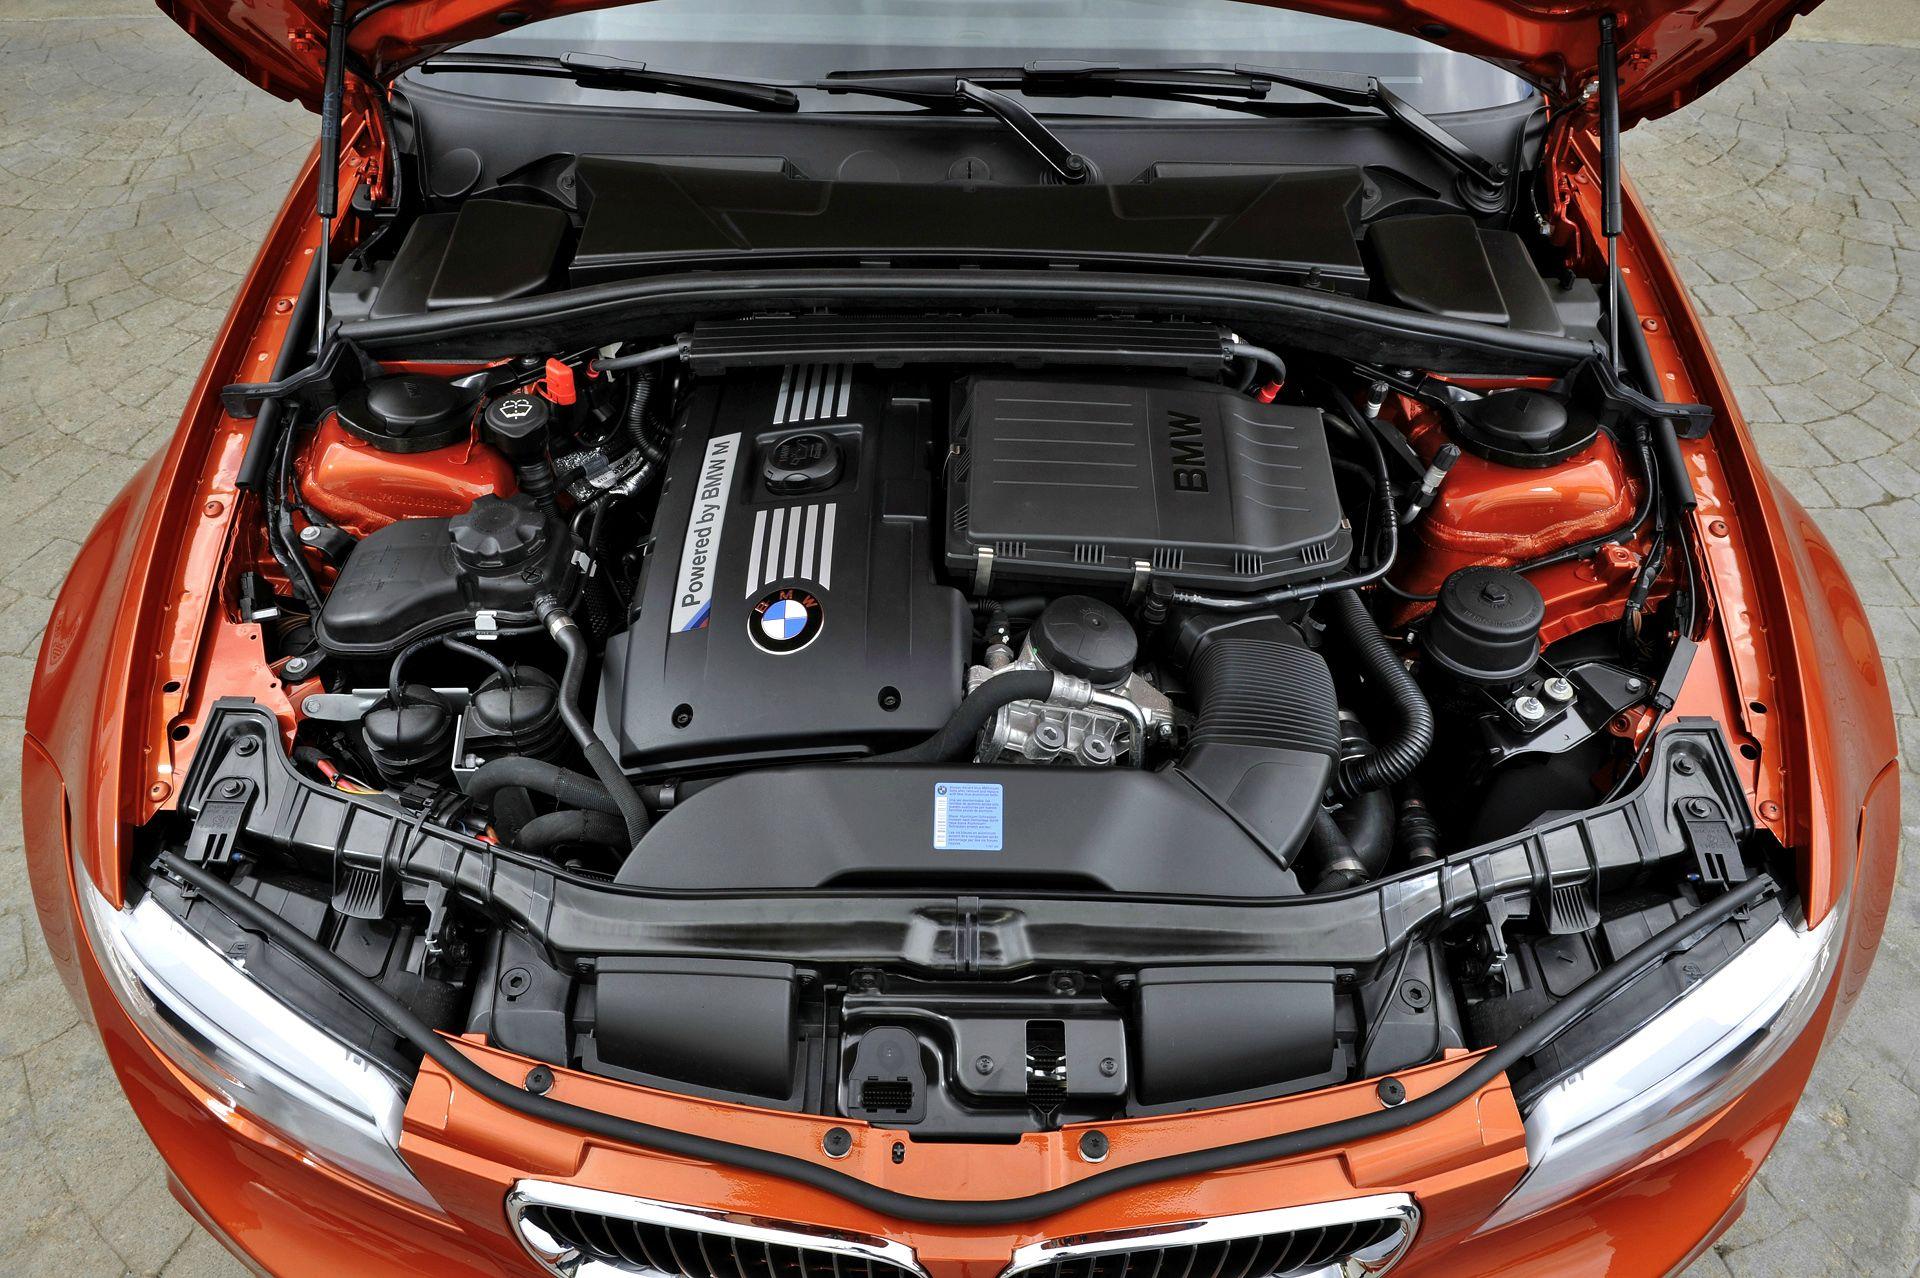 hight resolution of bmw n54 best bmw engine for tuners 2011 bmw 335i engine diagram 2008 bmw 335i engine